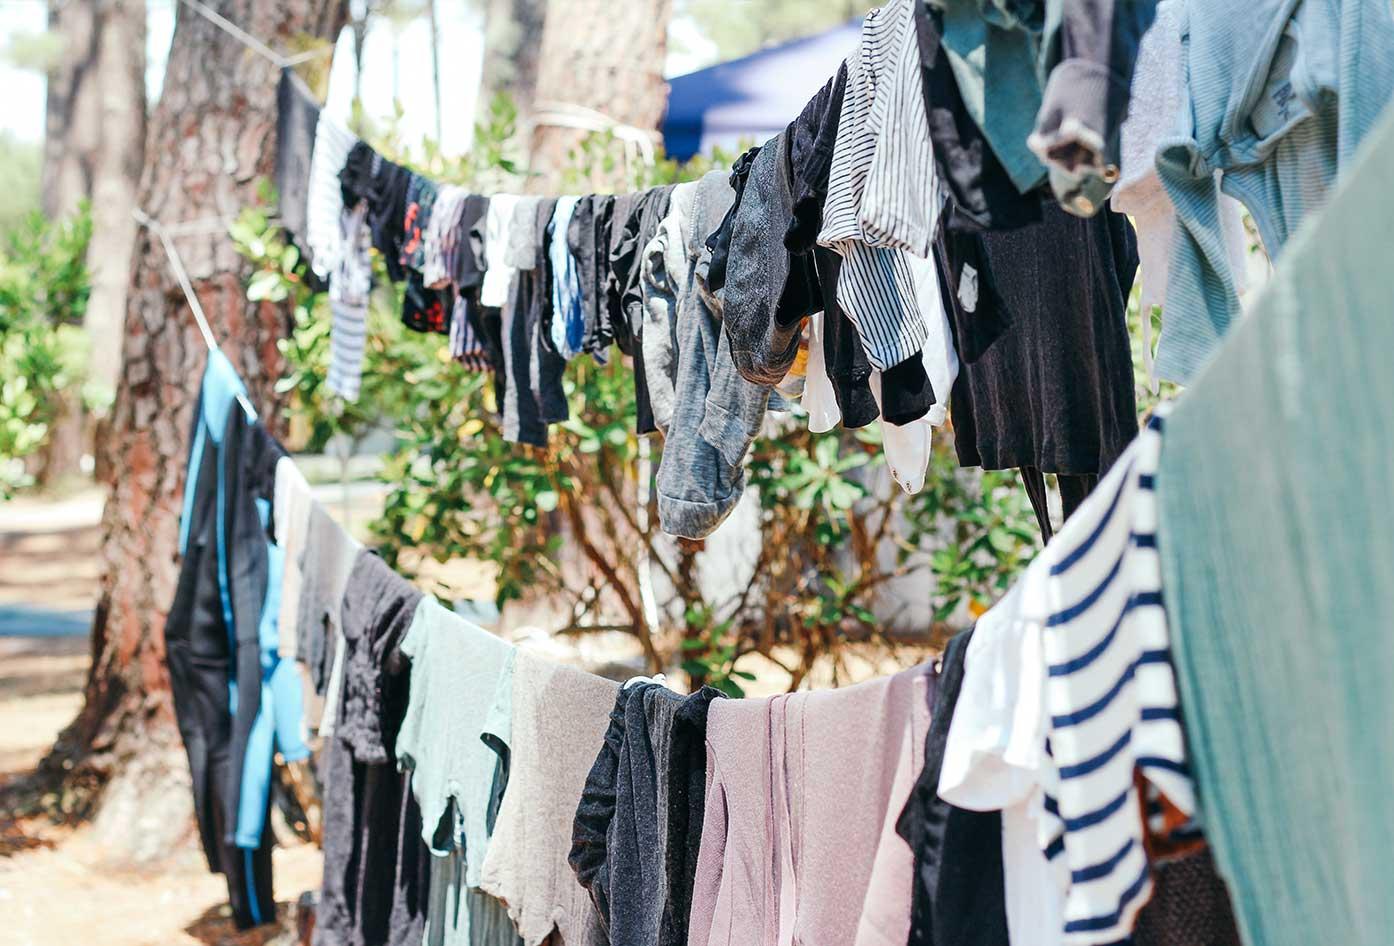 travel laundry hanging